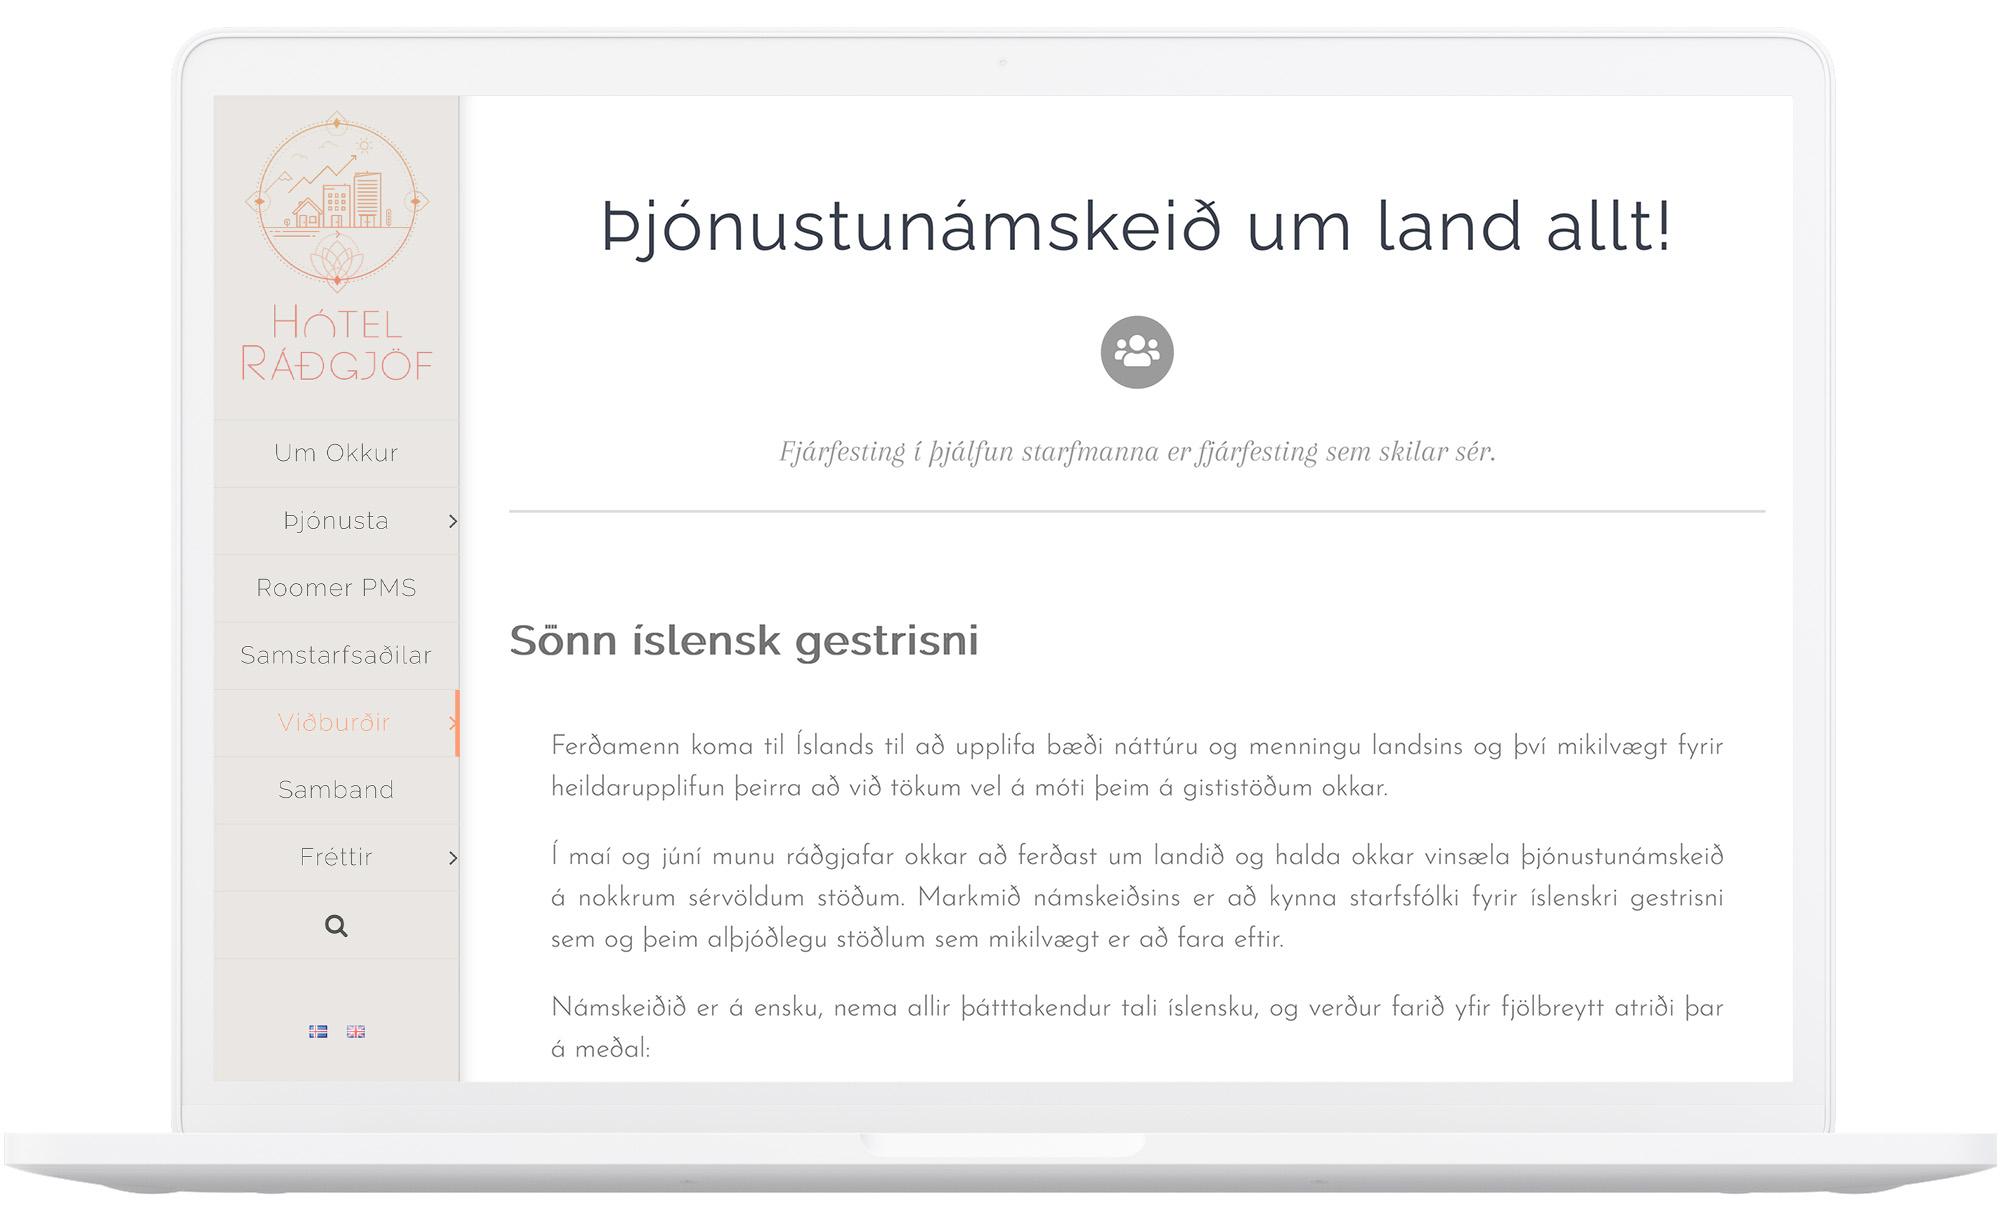 Hótelráðgjöf - Website